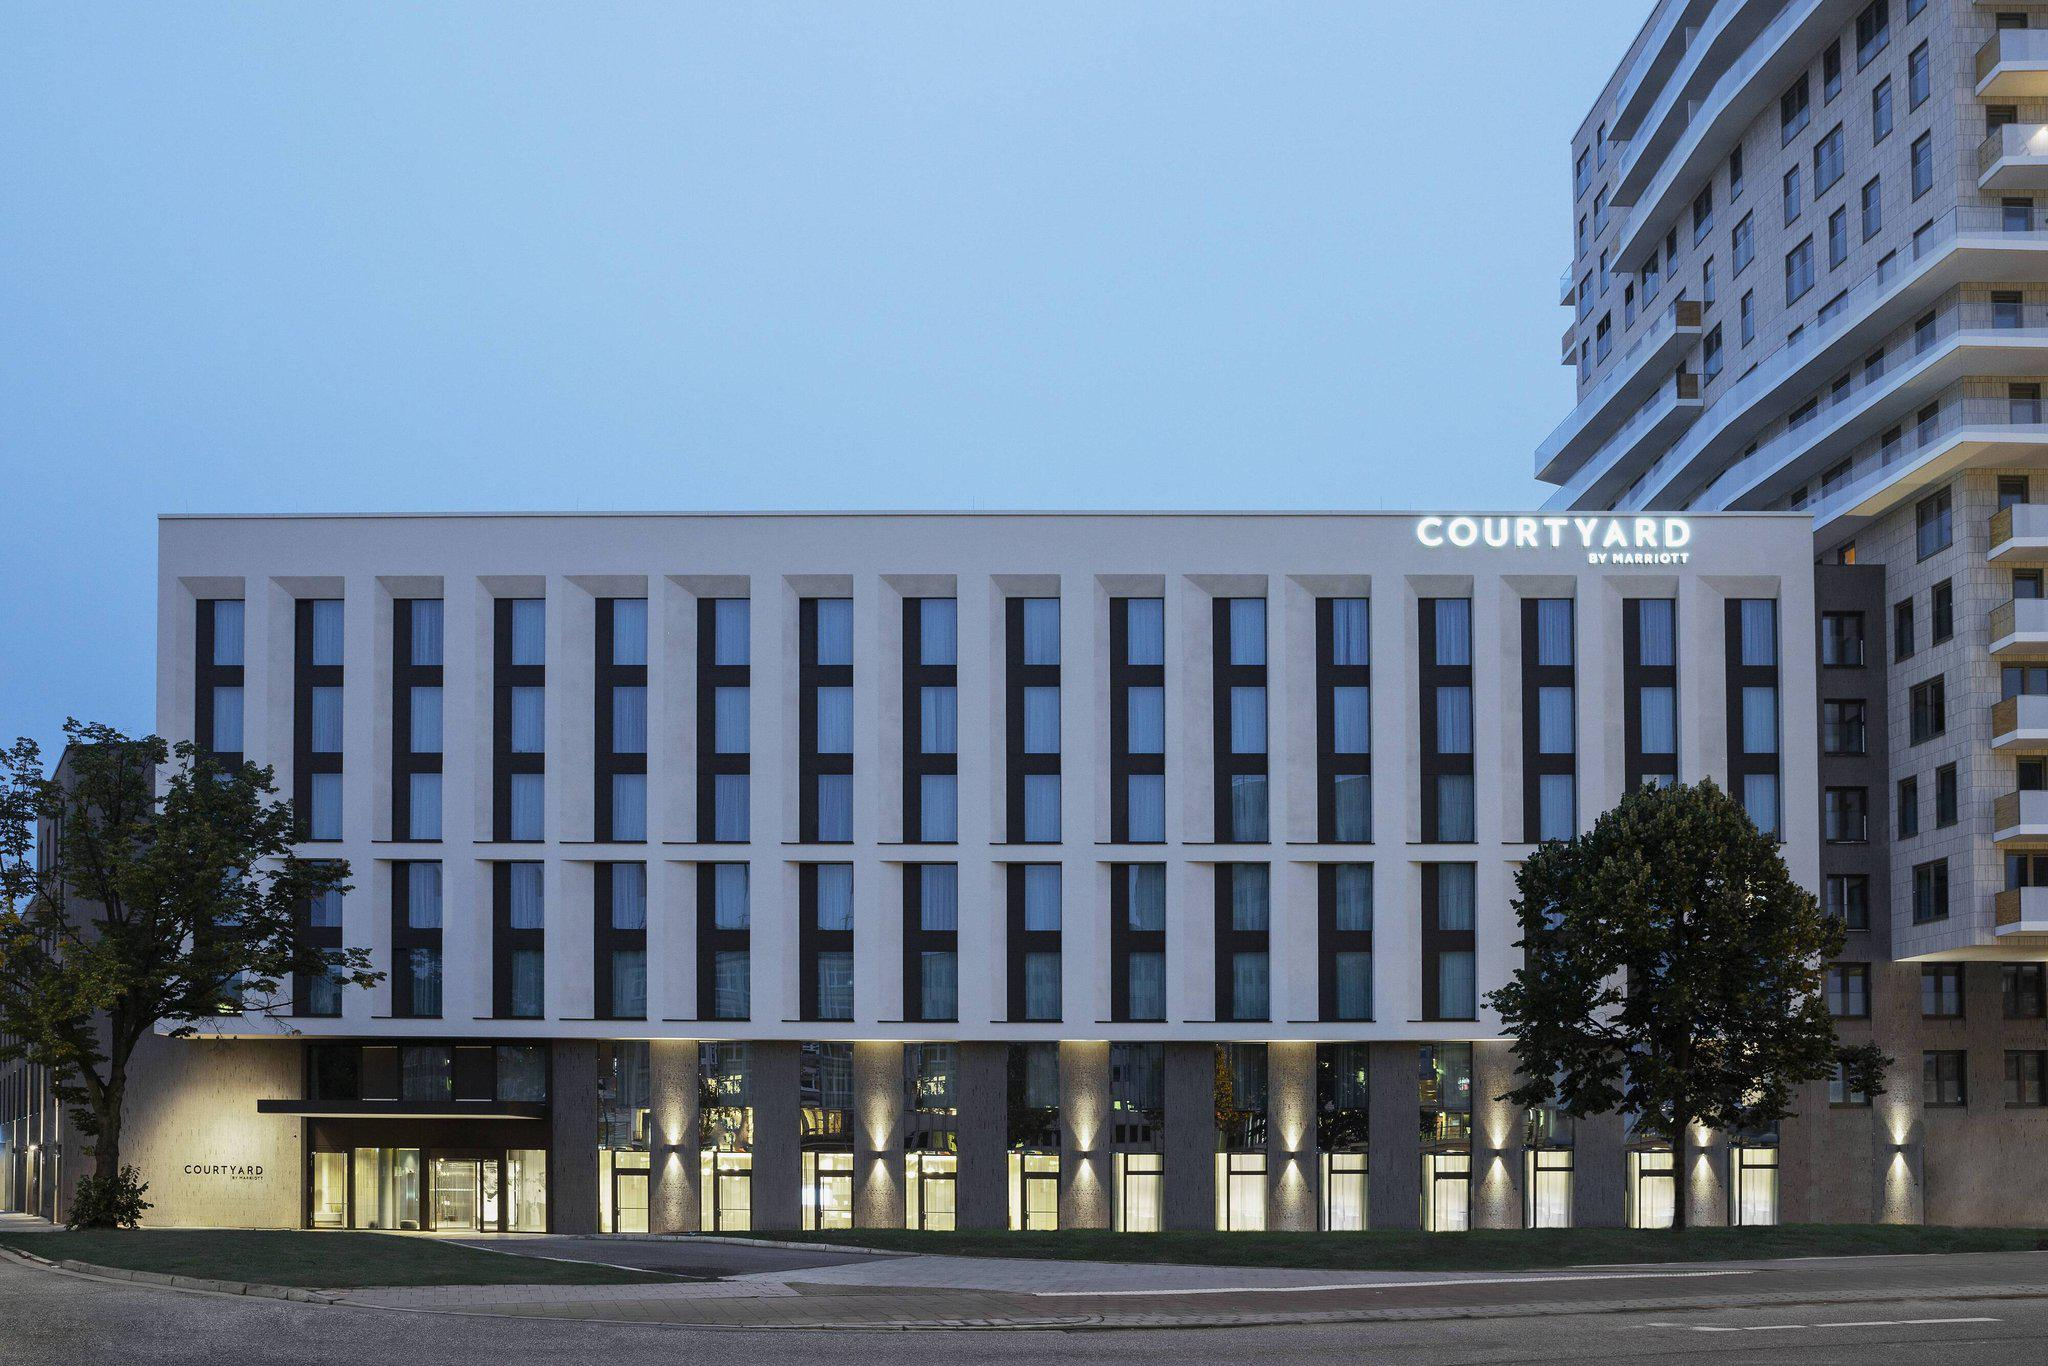 Courtyard by Marriott Hamburg City